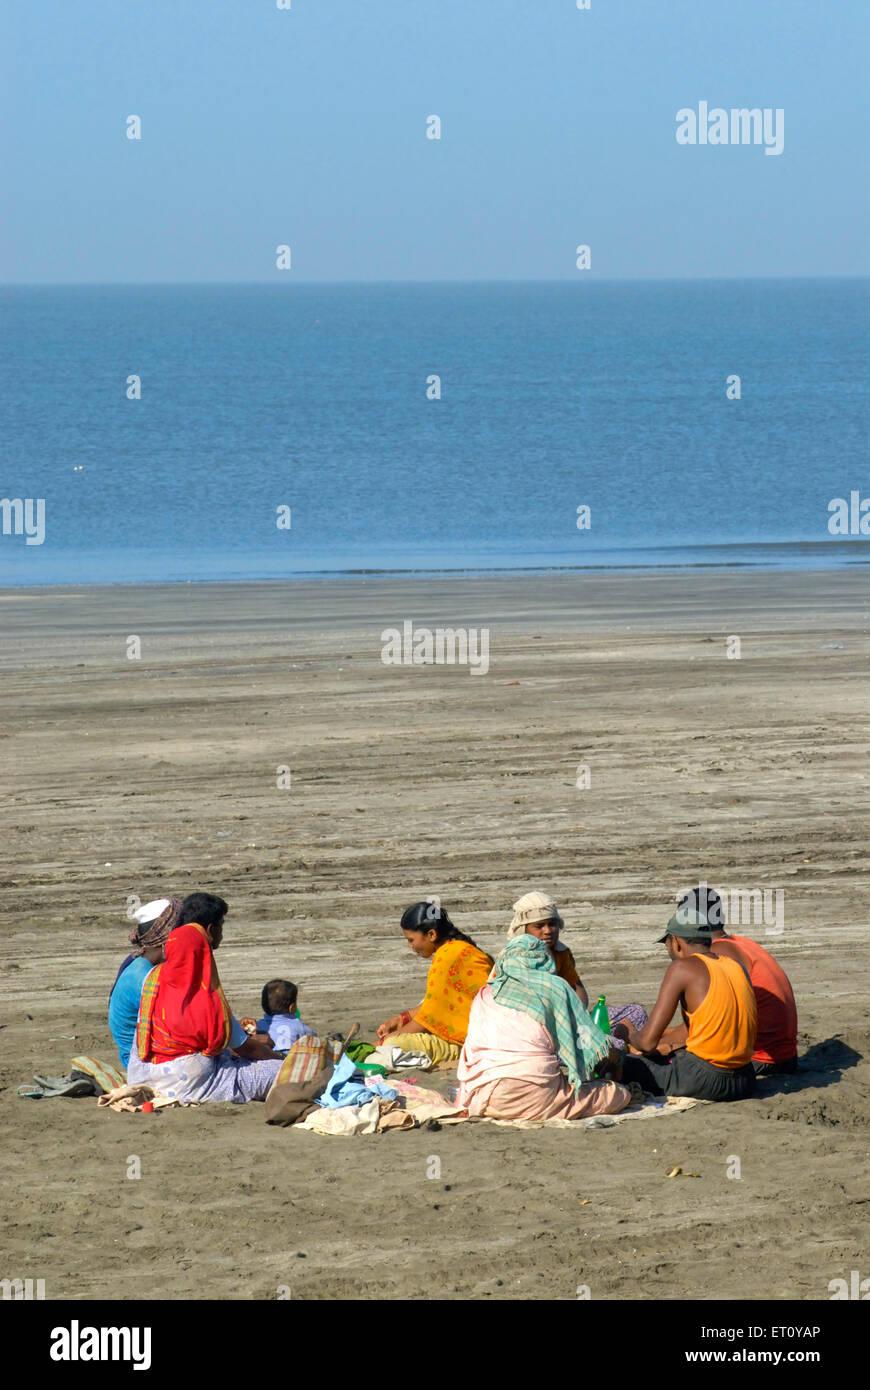 Labourers sitting on sand in round having lunch Arabian sea behind at Kalamb beach ; Bassein Vasai ; District Thane - Stock Image